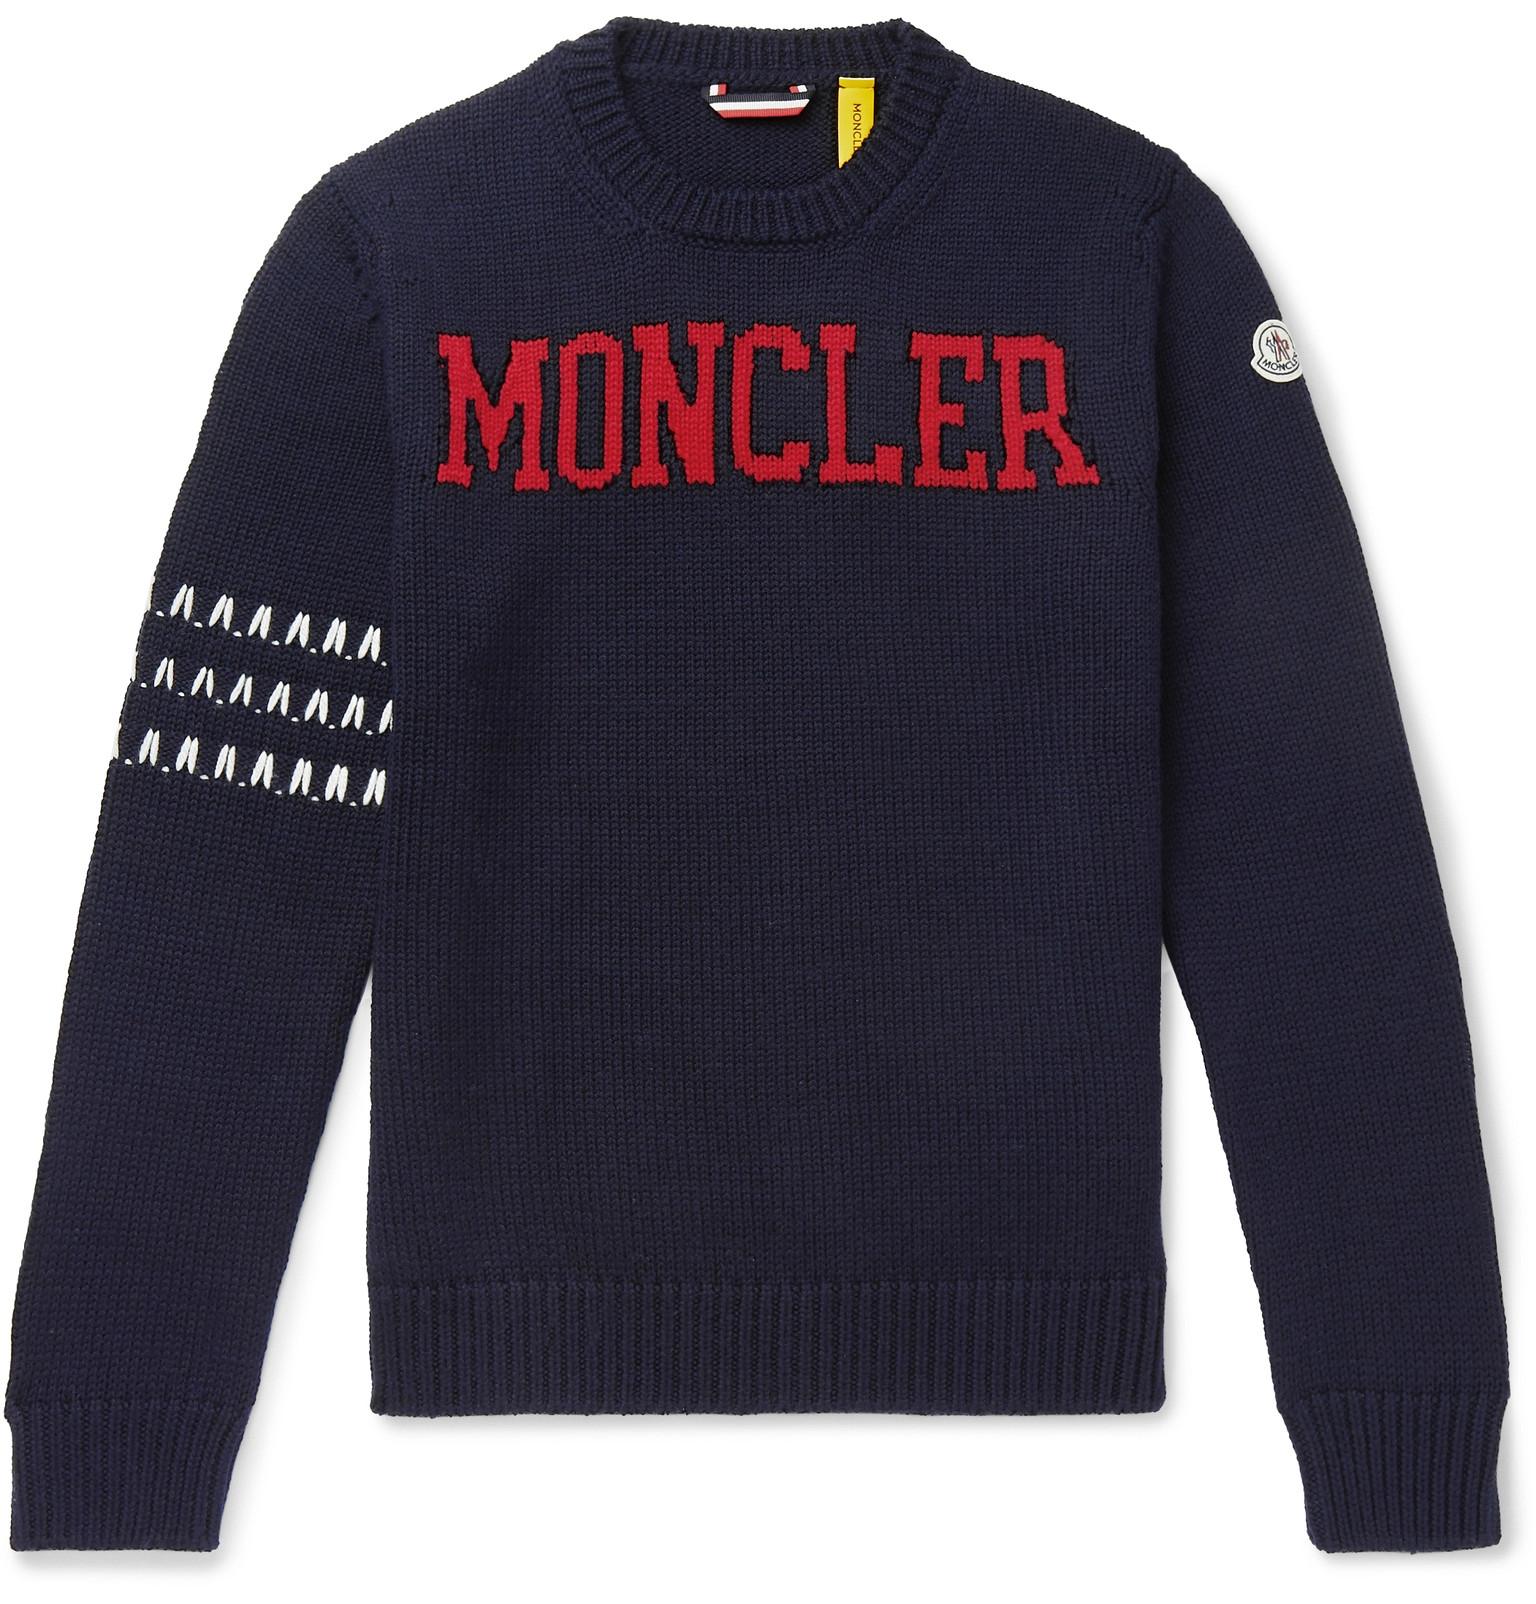 2c9ae1e0da233 Moncler Genius - 2 Moncler 1952 Logo-Intarsia Virgin Wool Sweater